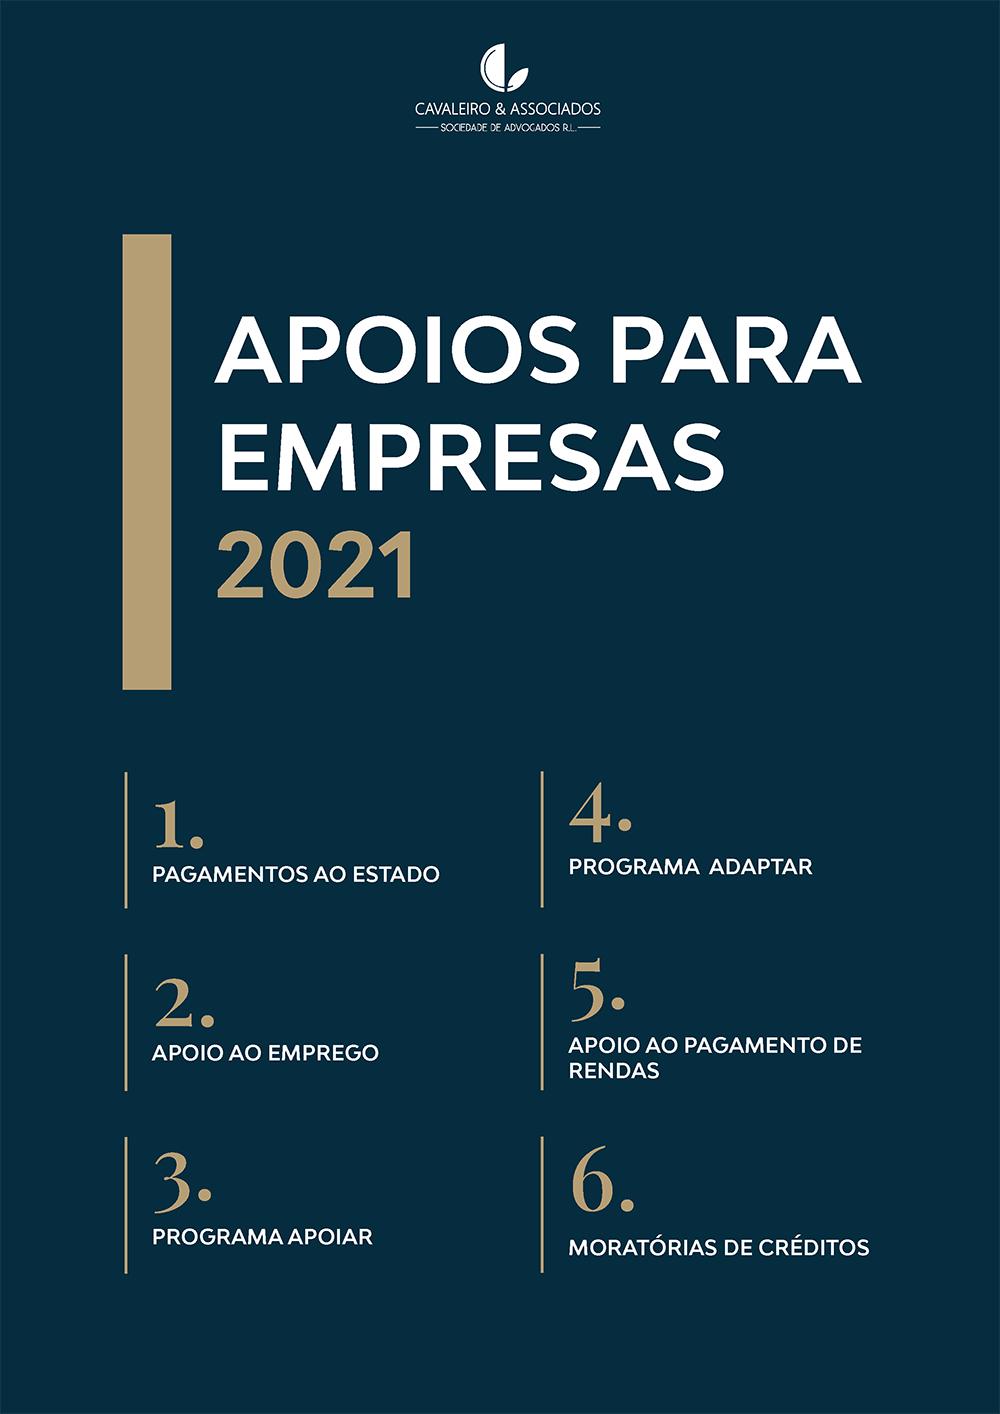 Apoio às empresas 2021